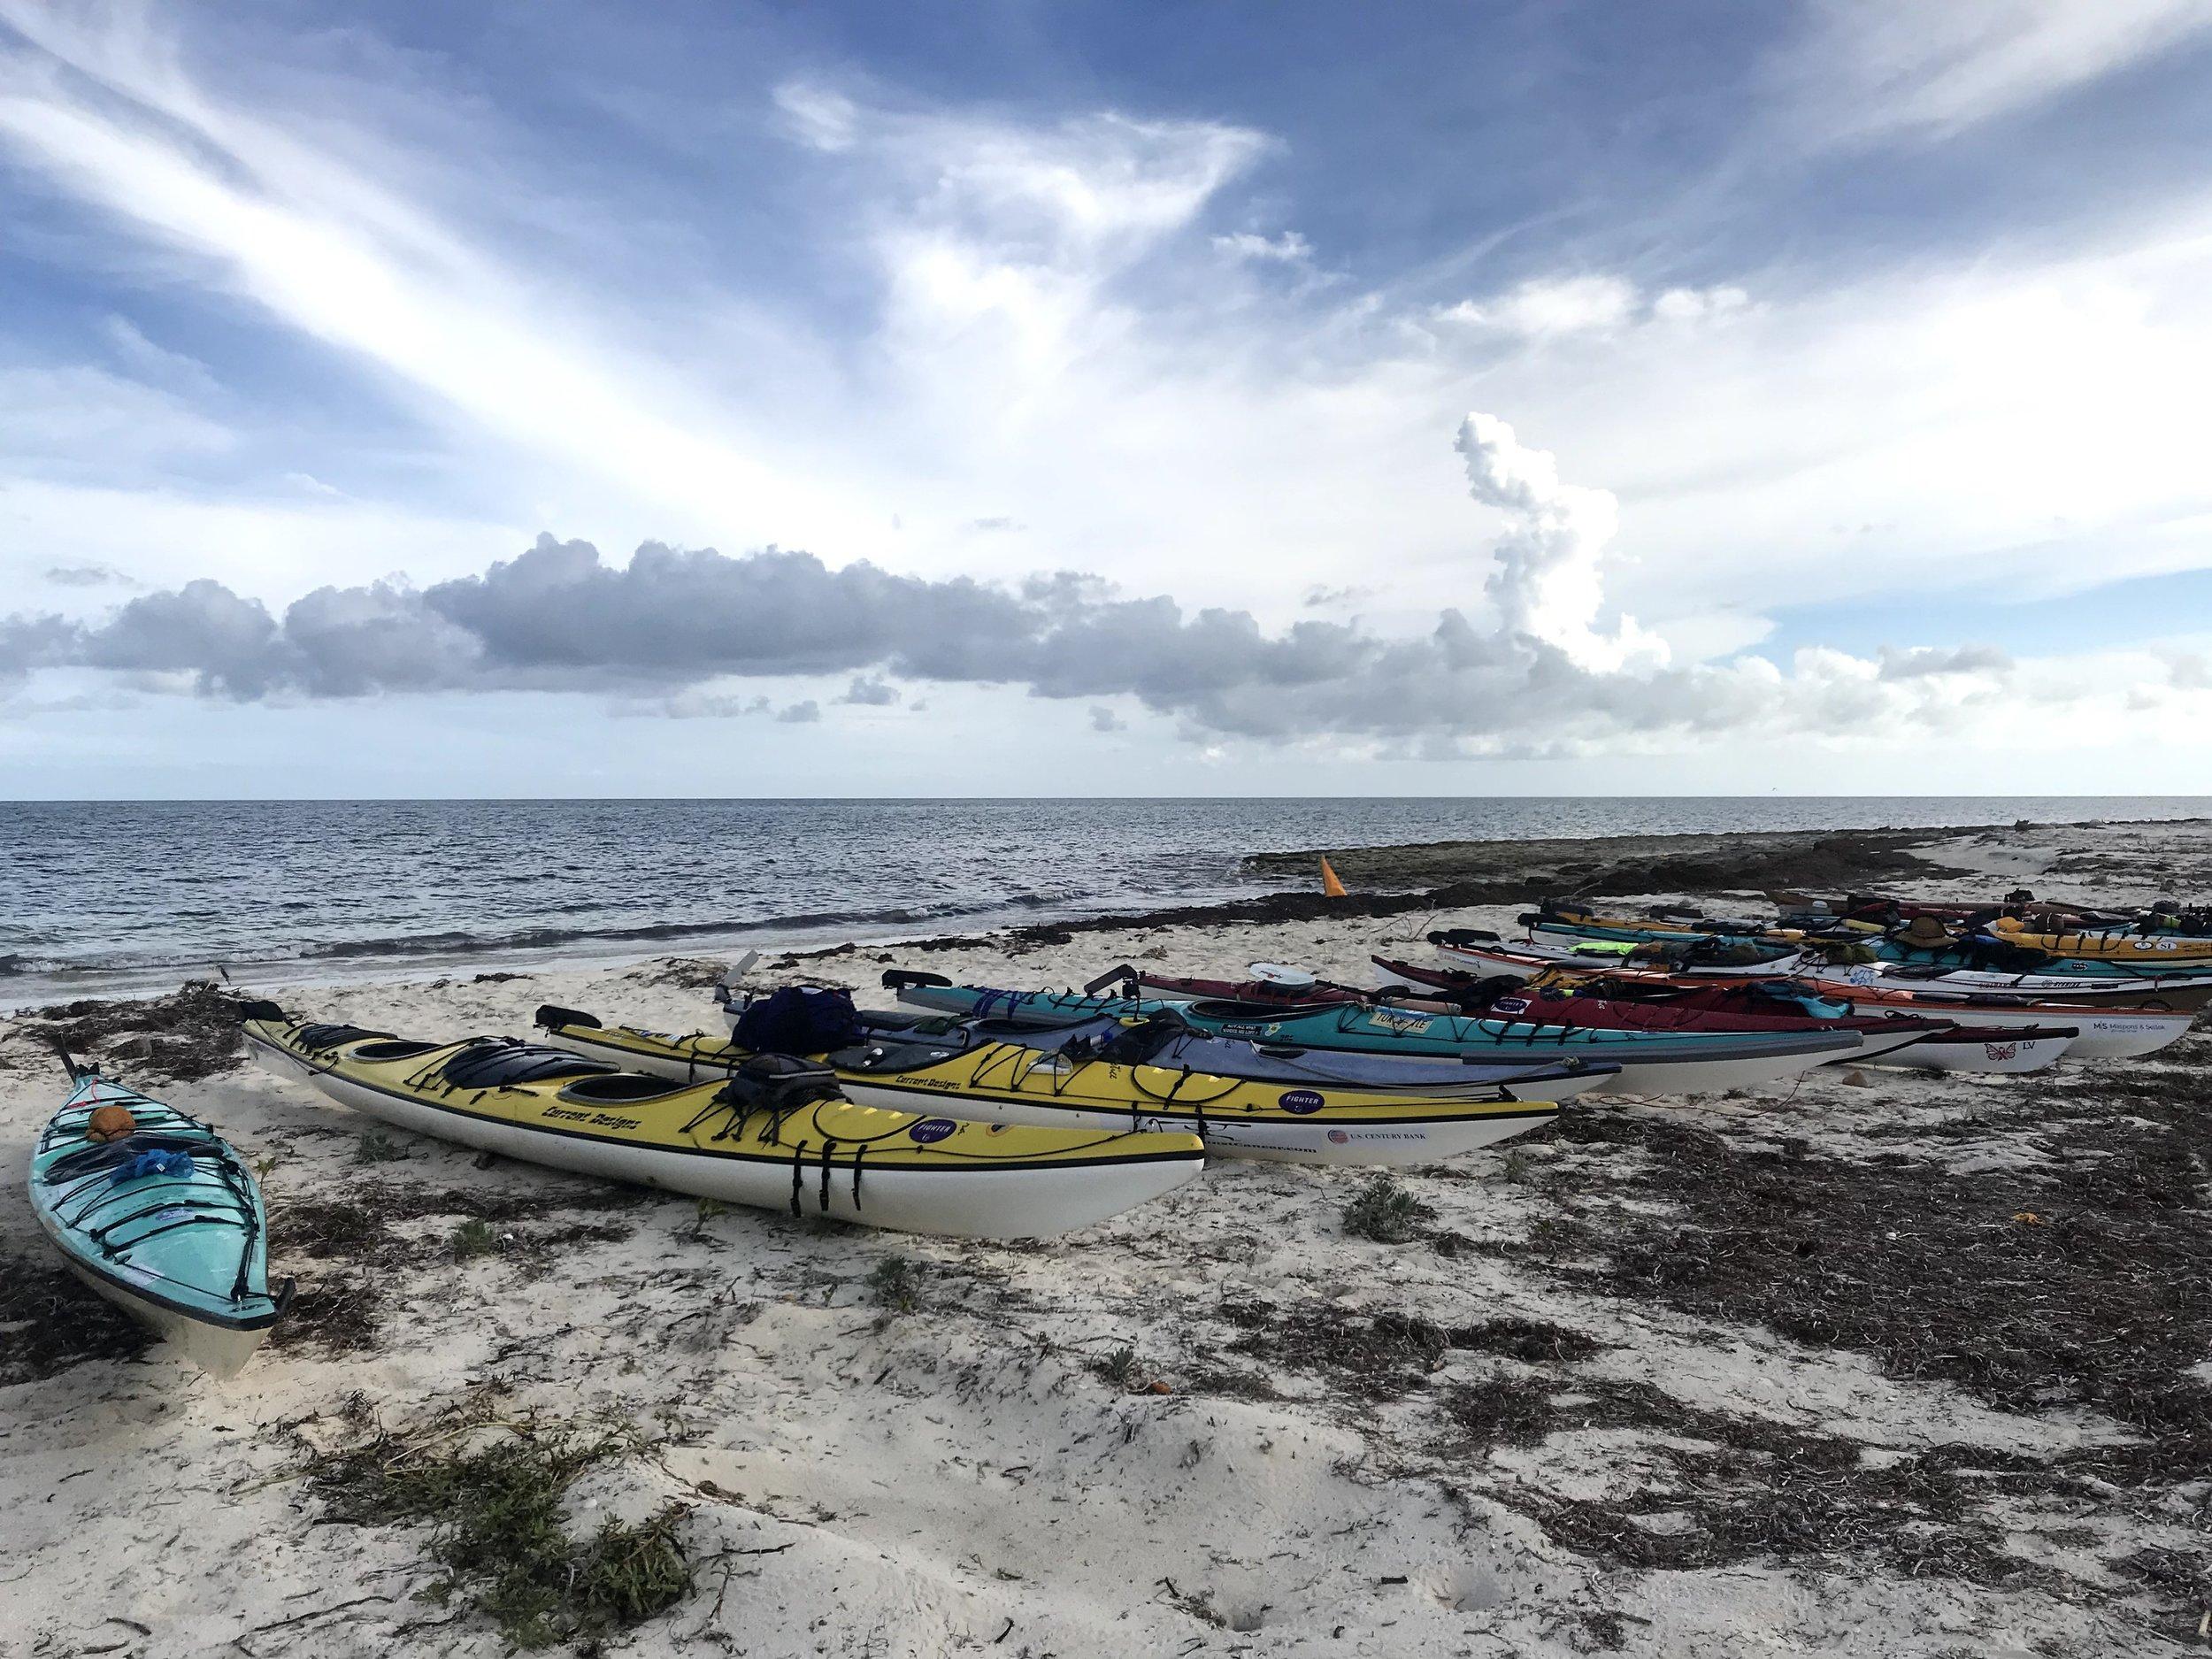 Kayaks on Beach - IMG_9249.jpg